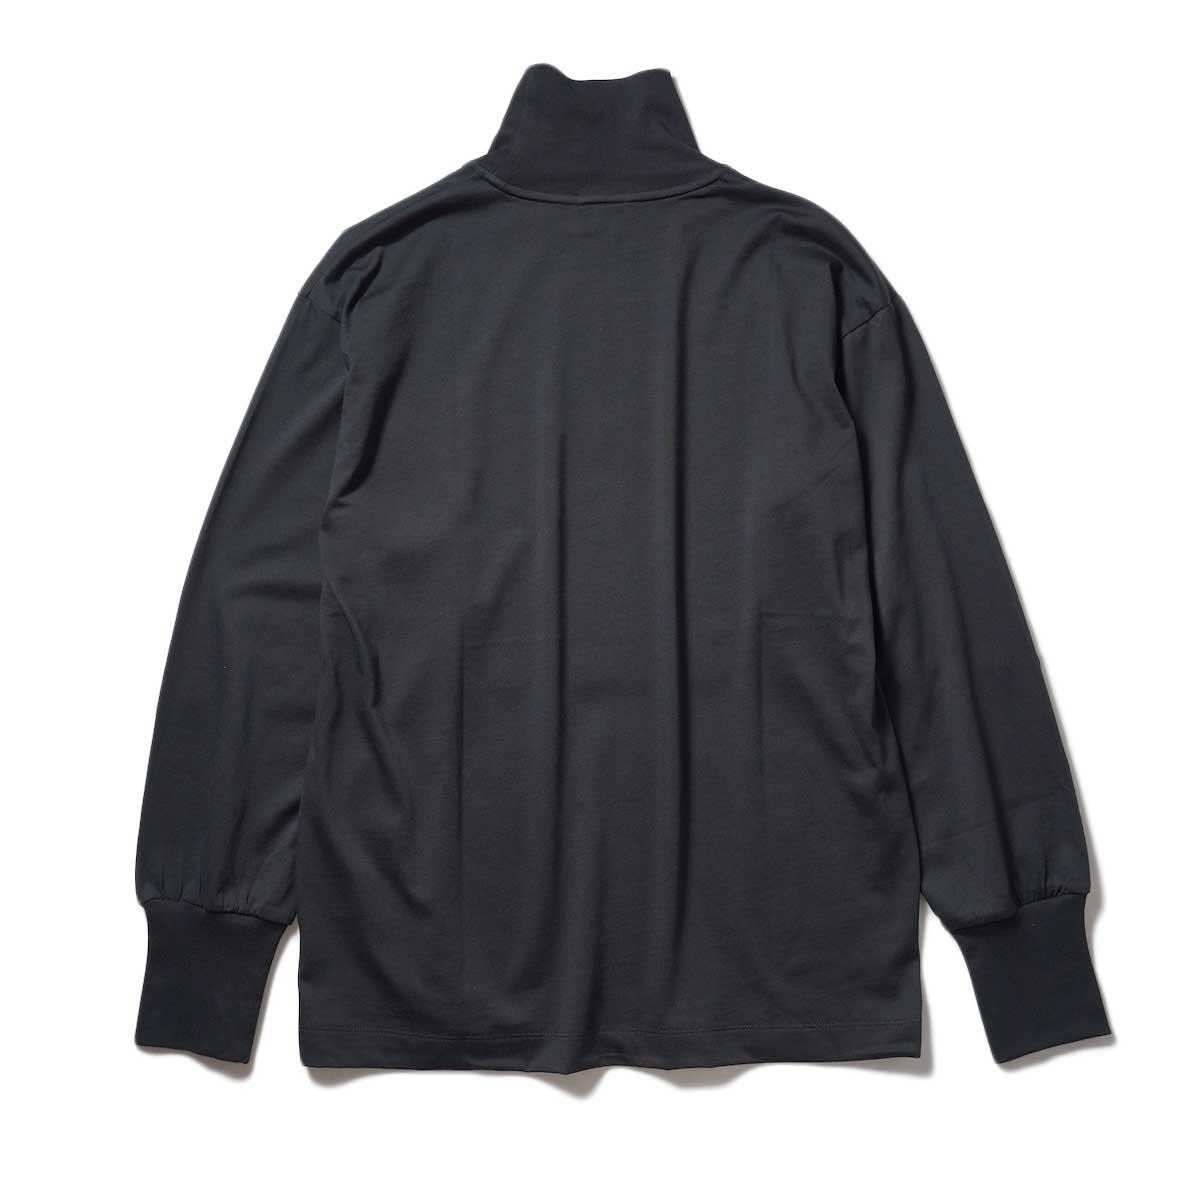 YLEVE / SOFT ORGANIC COTTON TURTLE (Black) 背面